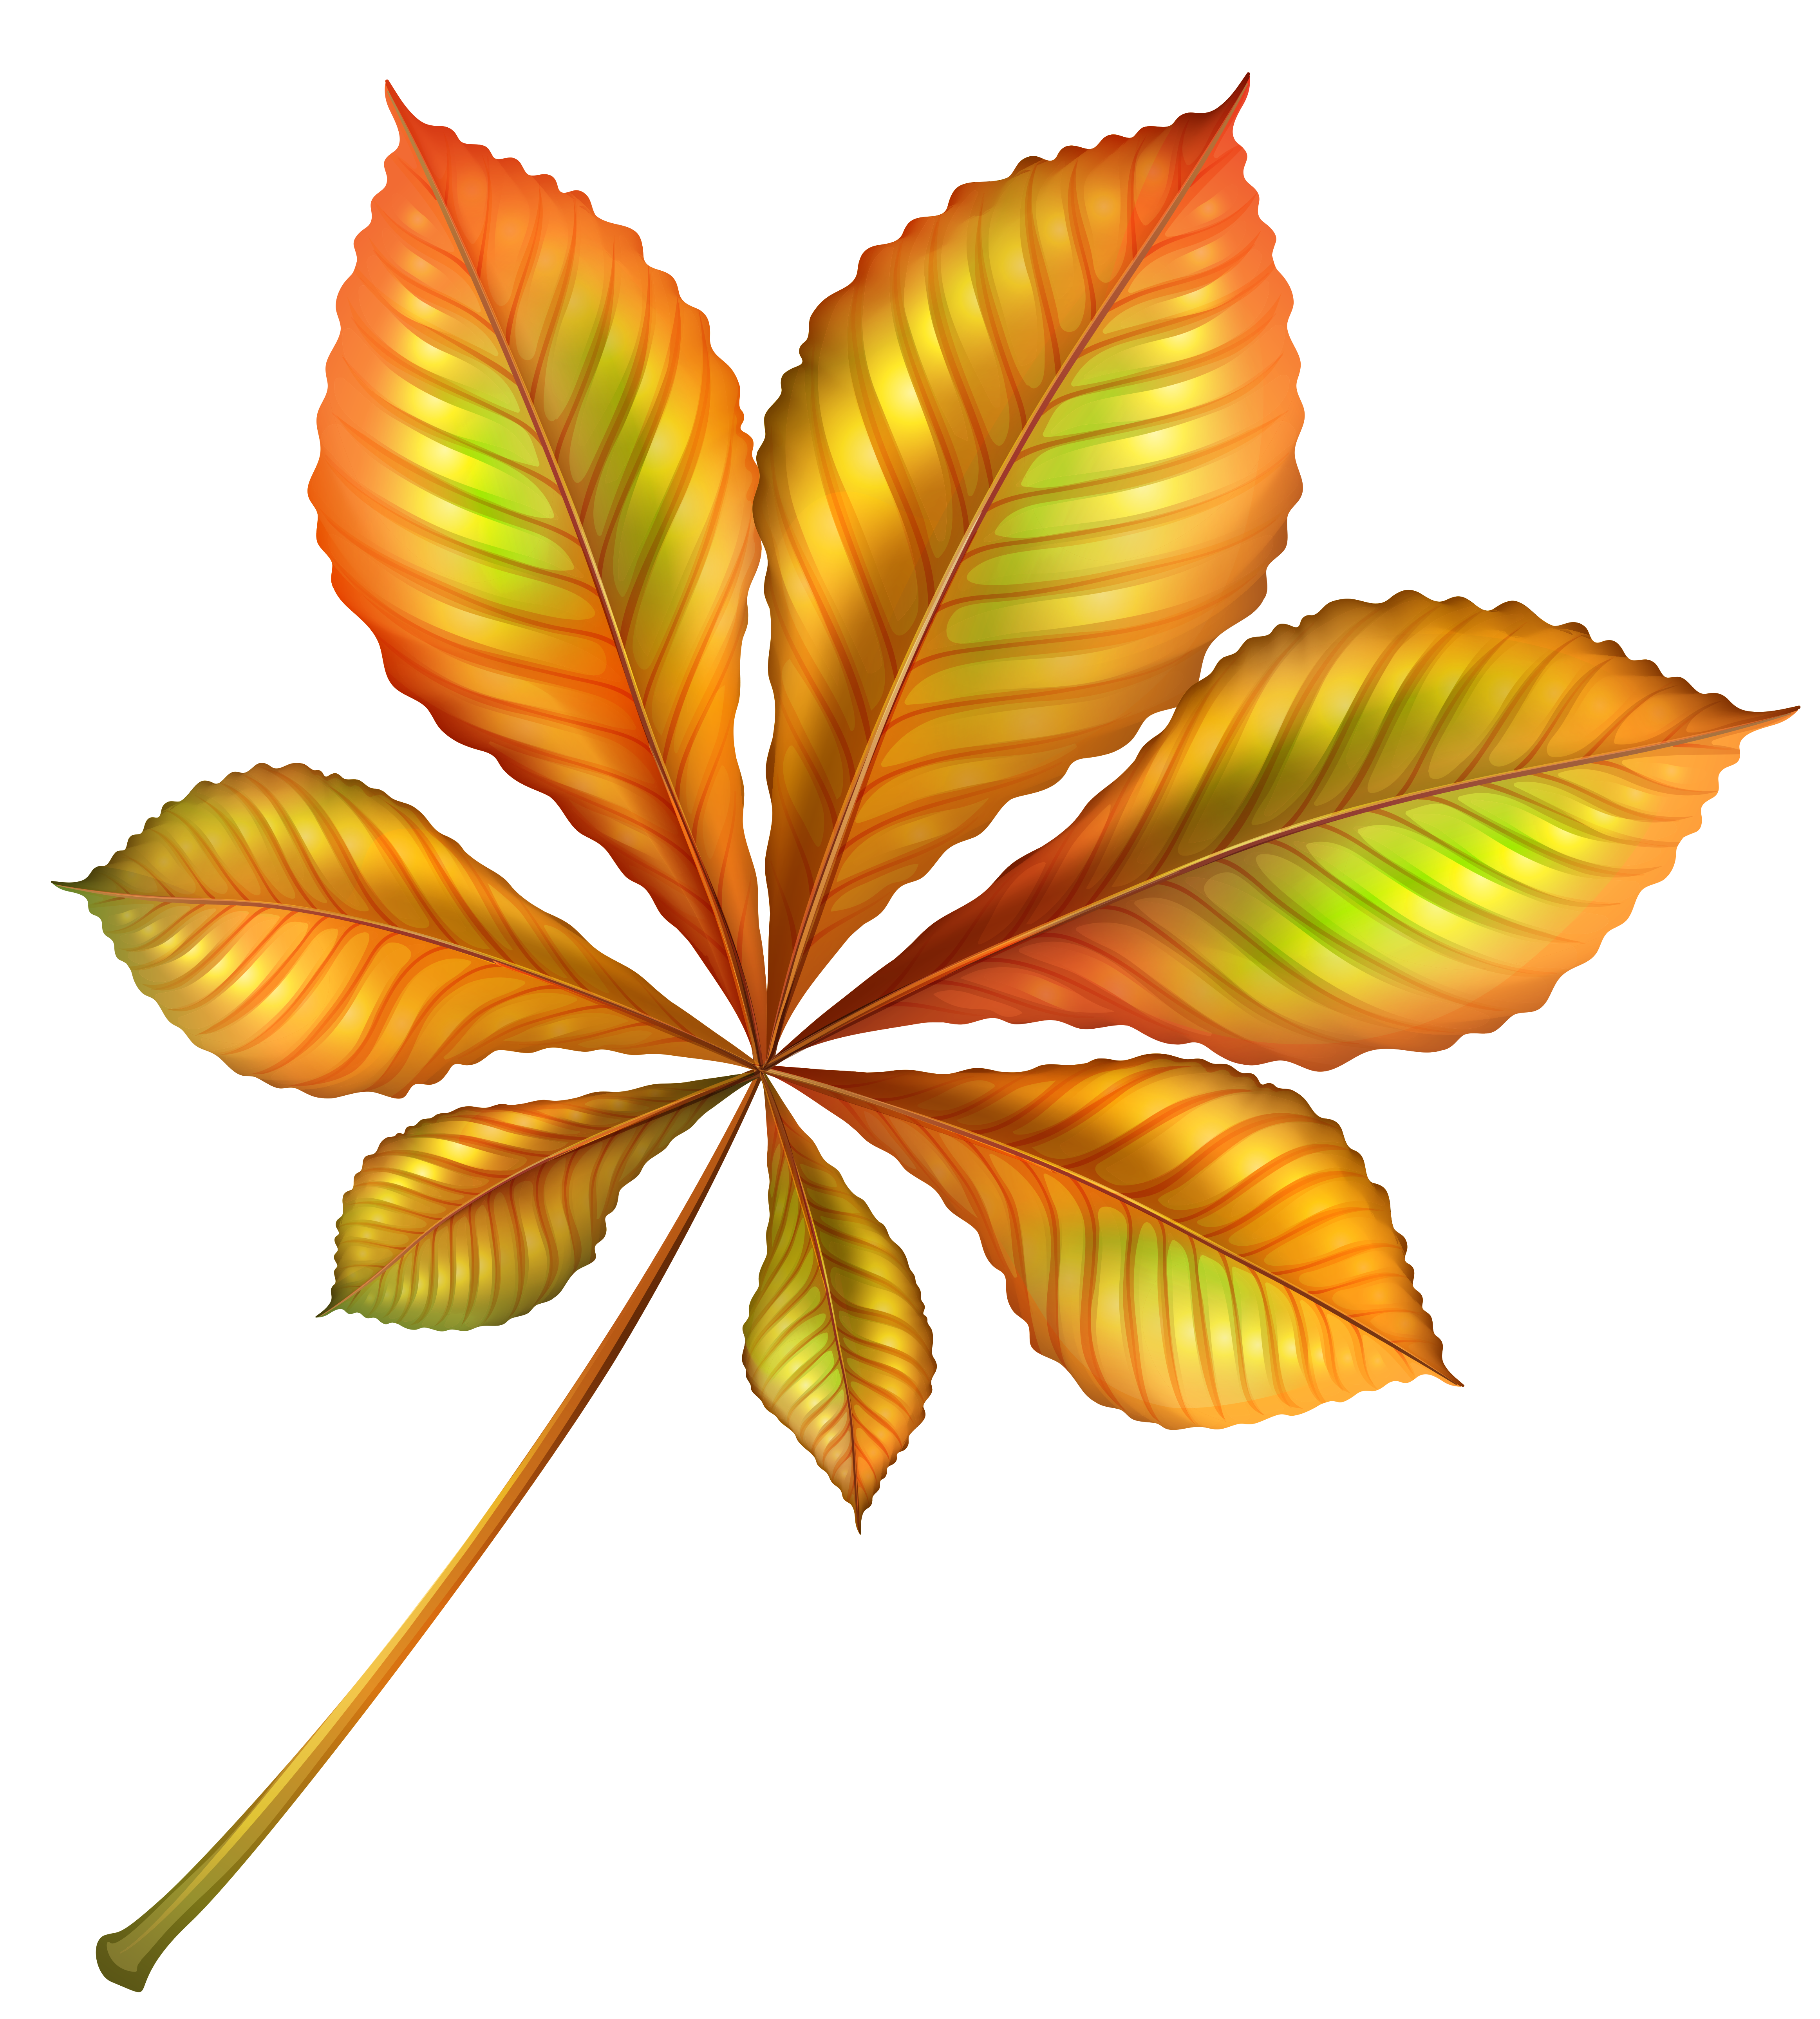 Beautiful Autumn Orange Leaf PNG Clipart Image.